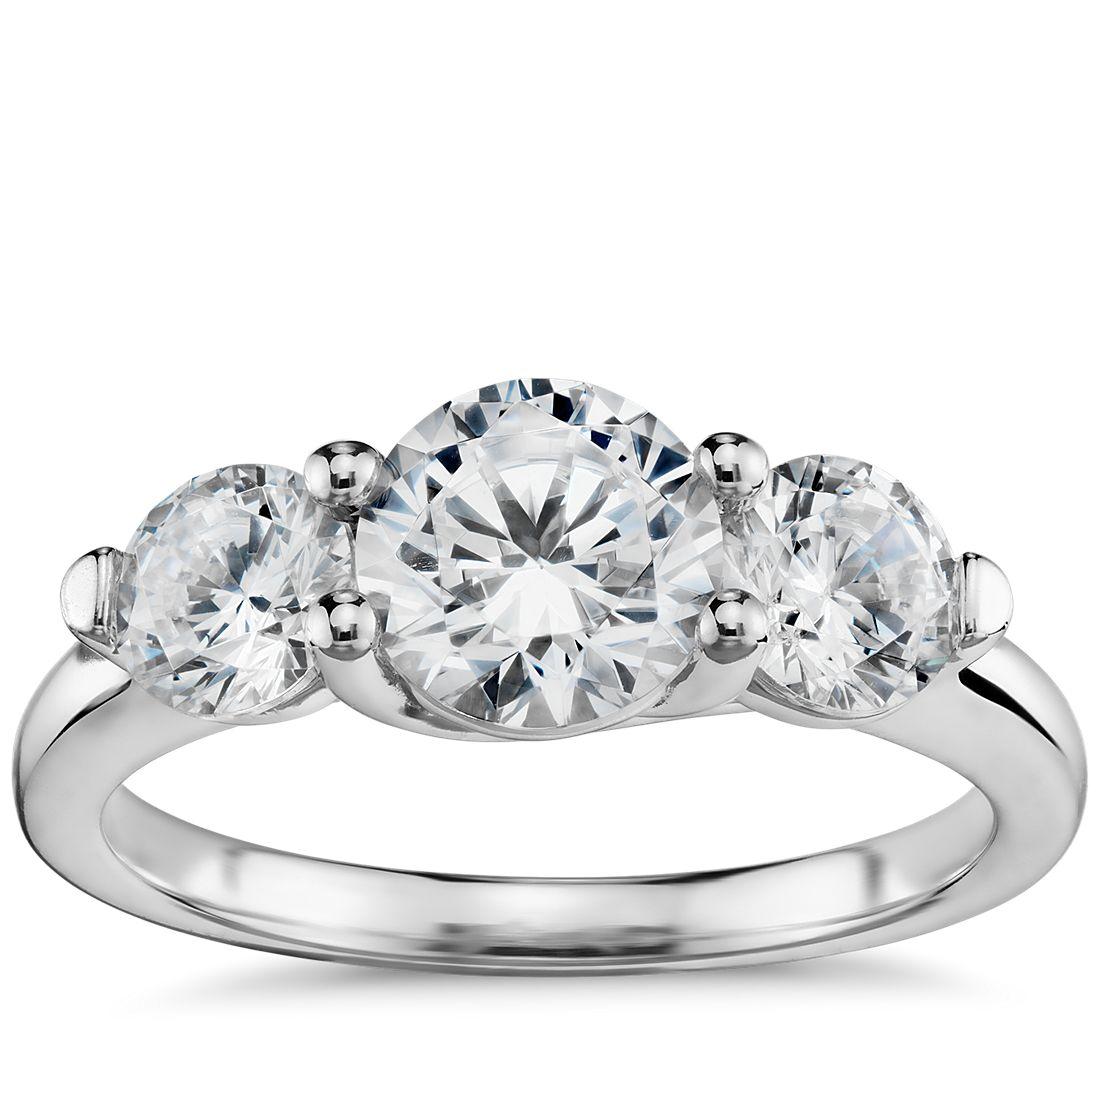 Three-Stone Petite Trellis Diamond Engagement Ring in 14k White Gold